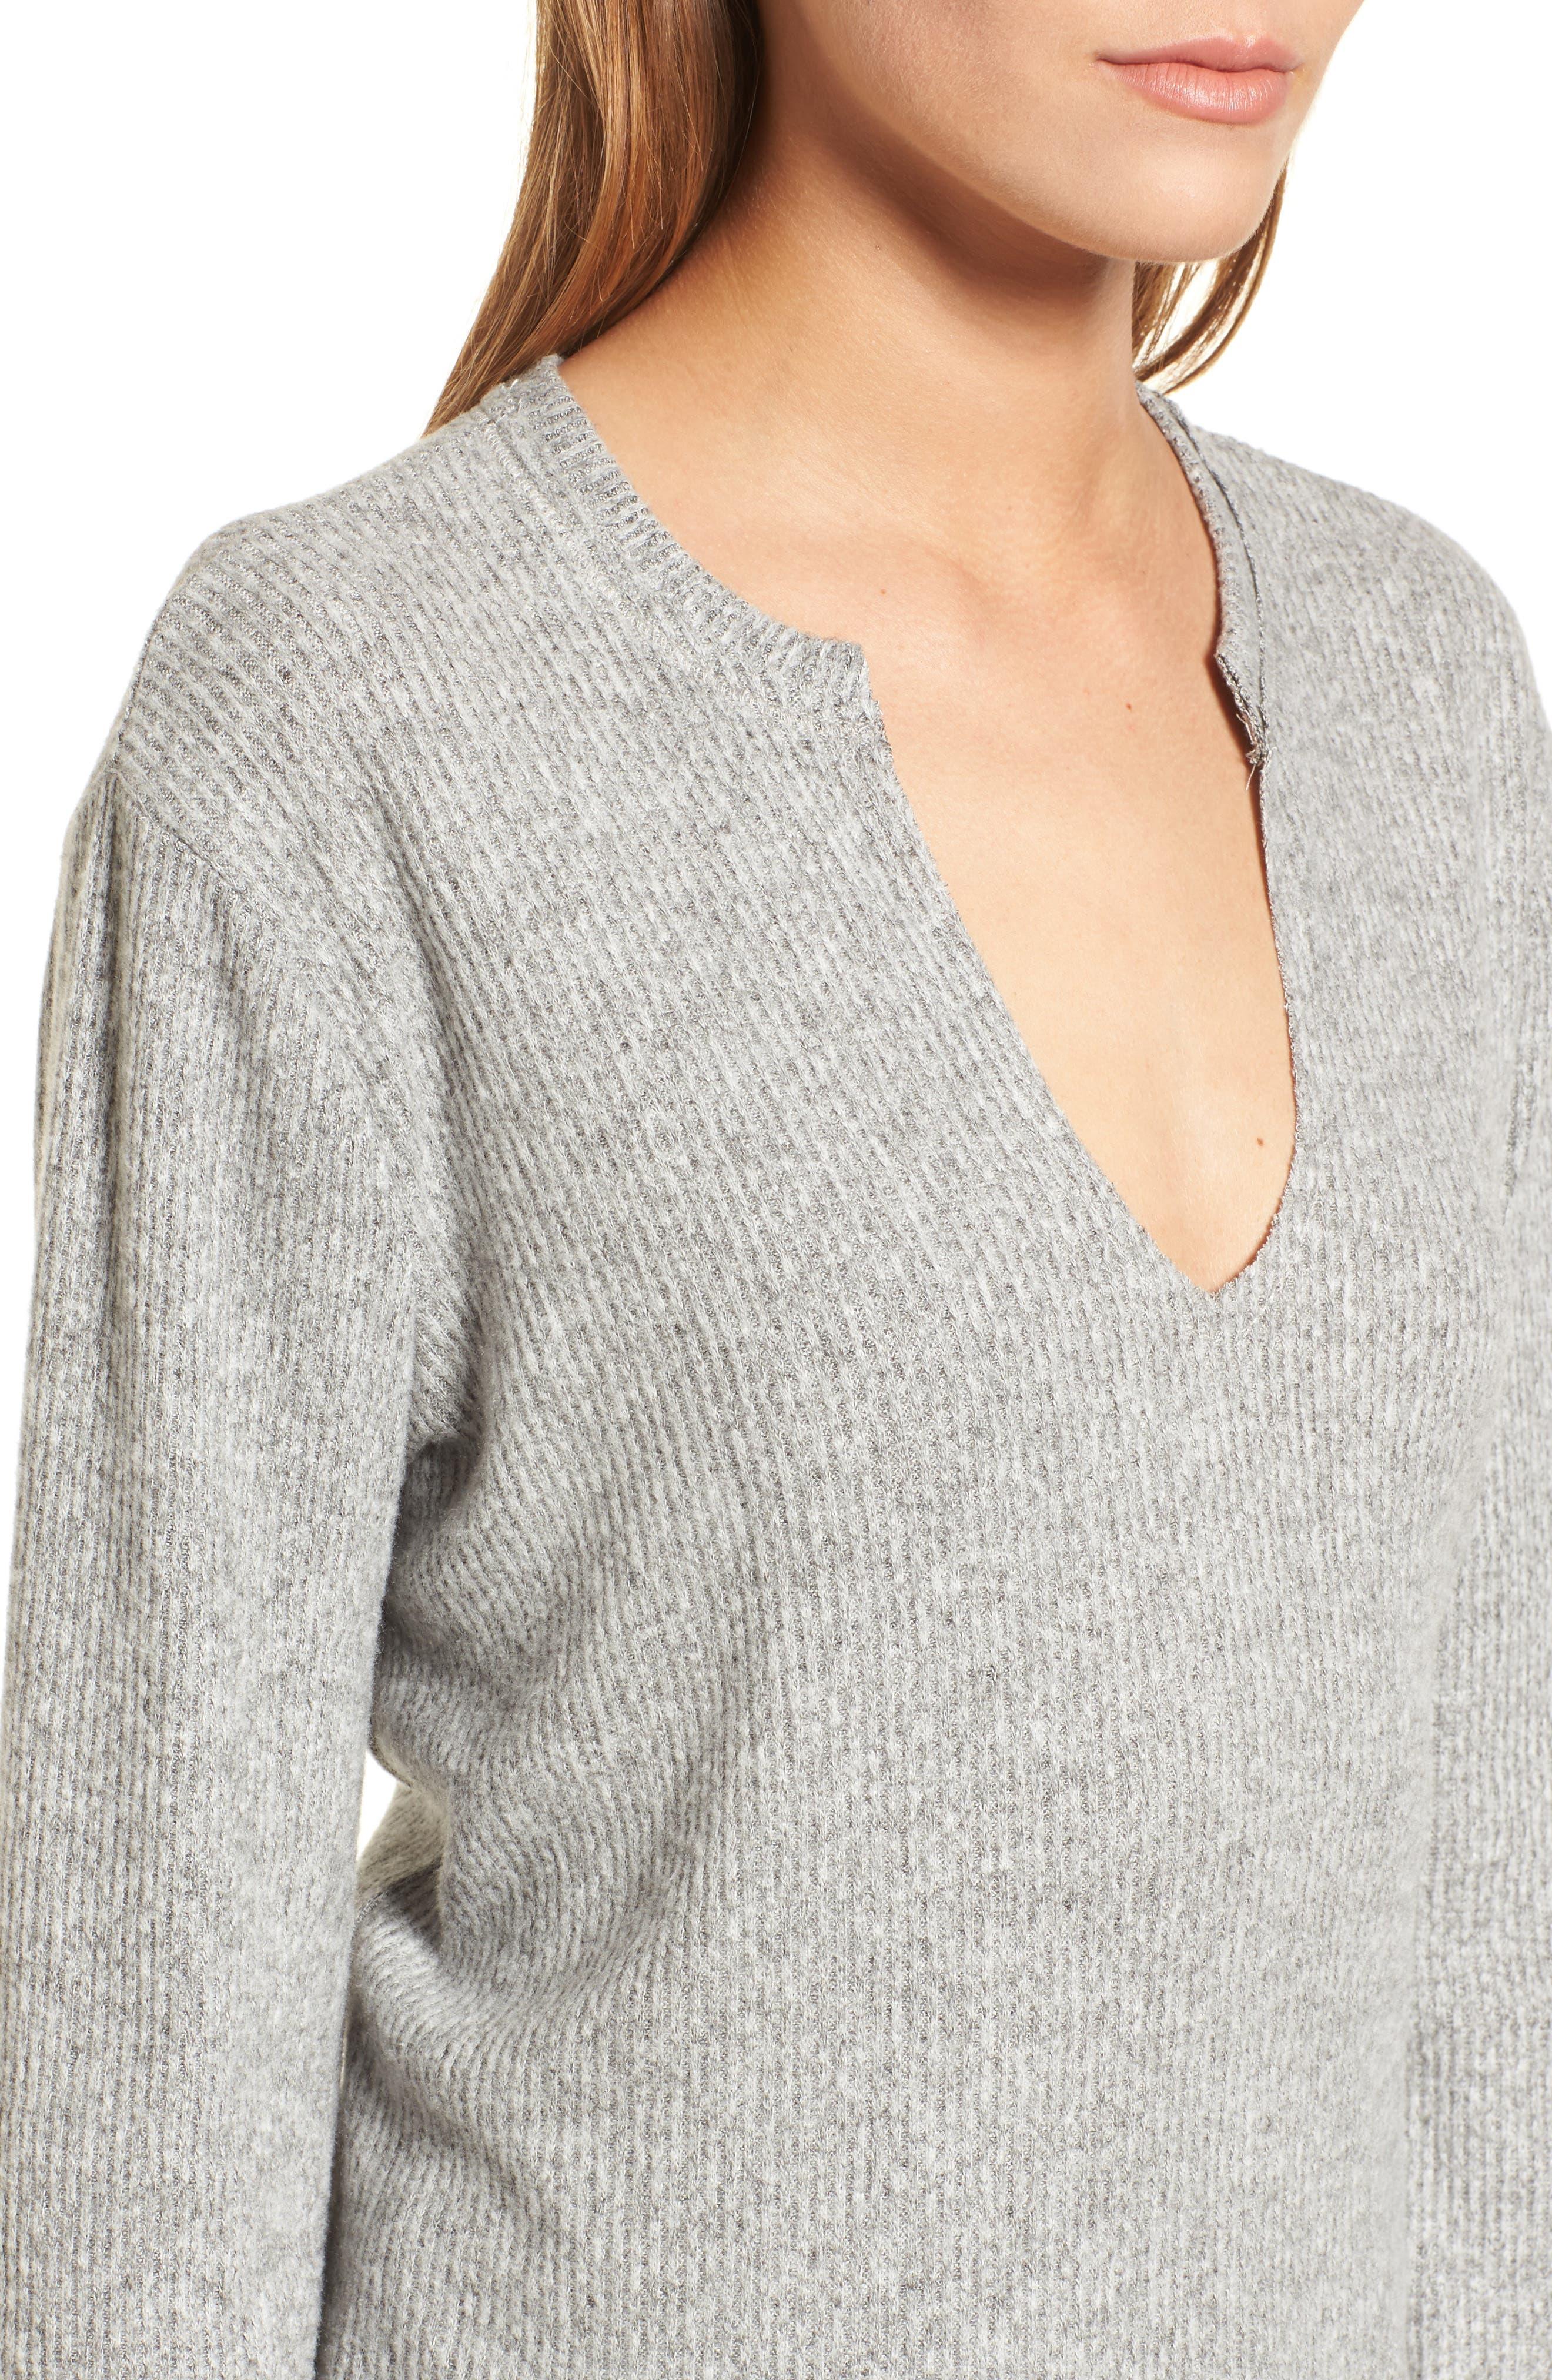 Ribbed Split Neck Sweater,                             Alternate thumbnail 4, color,                             Grey